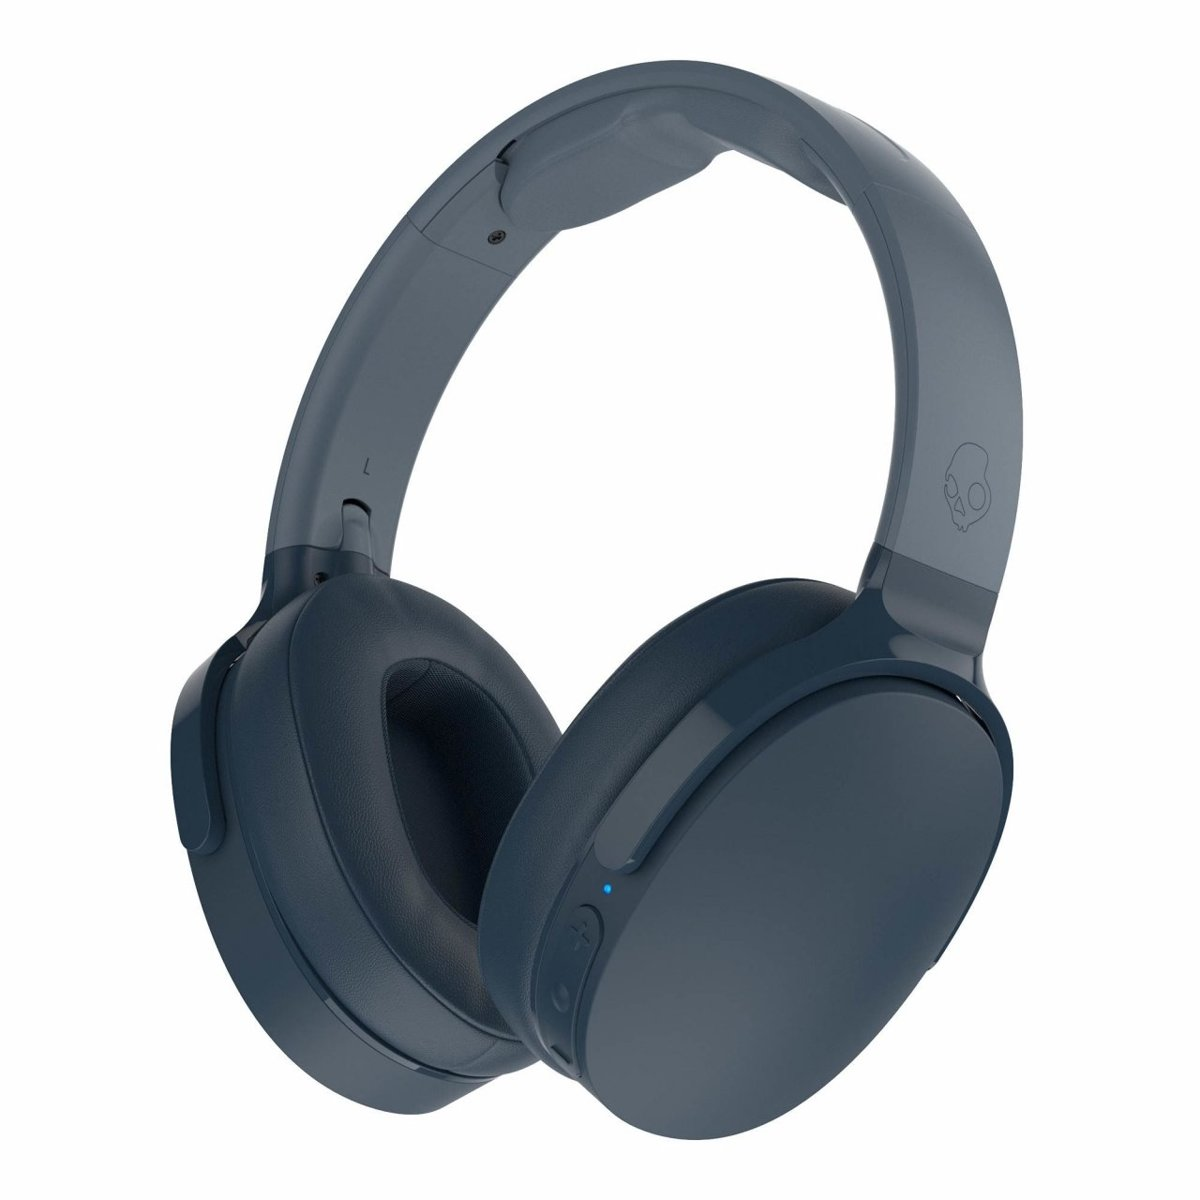 Hesh 3 Wireless headset